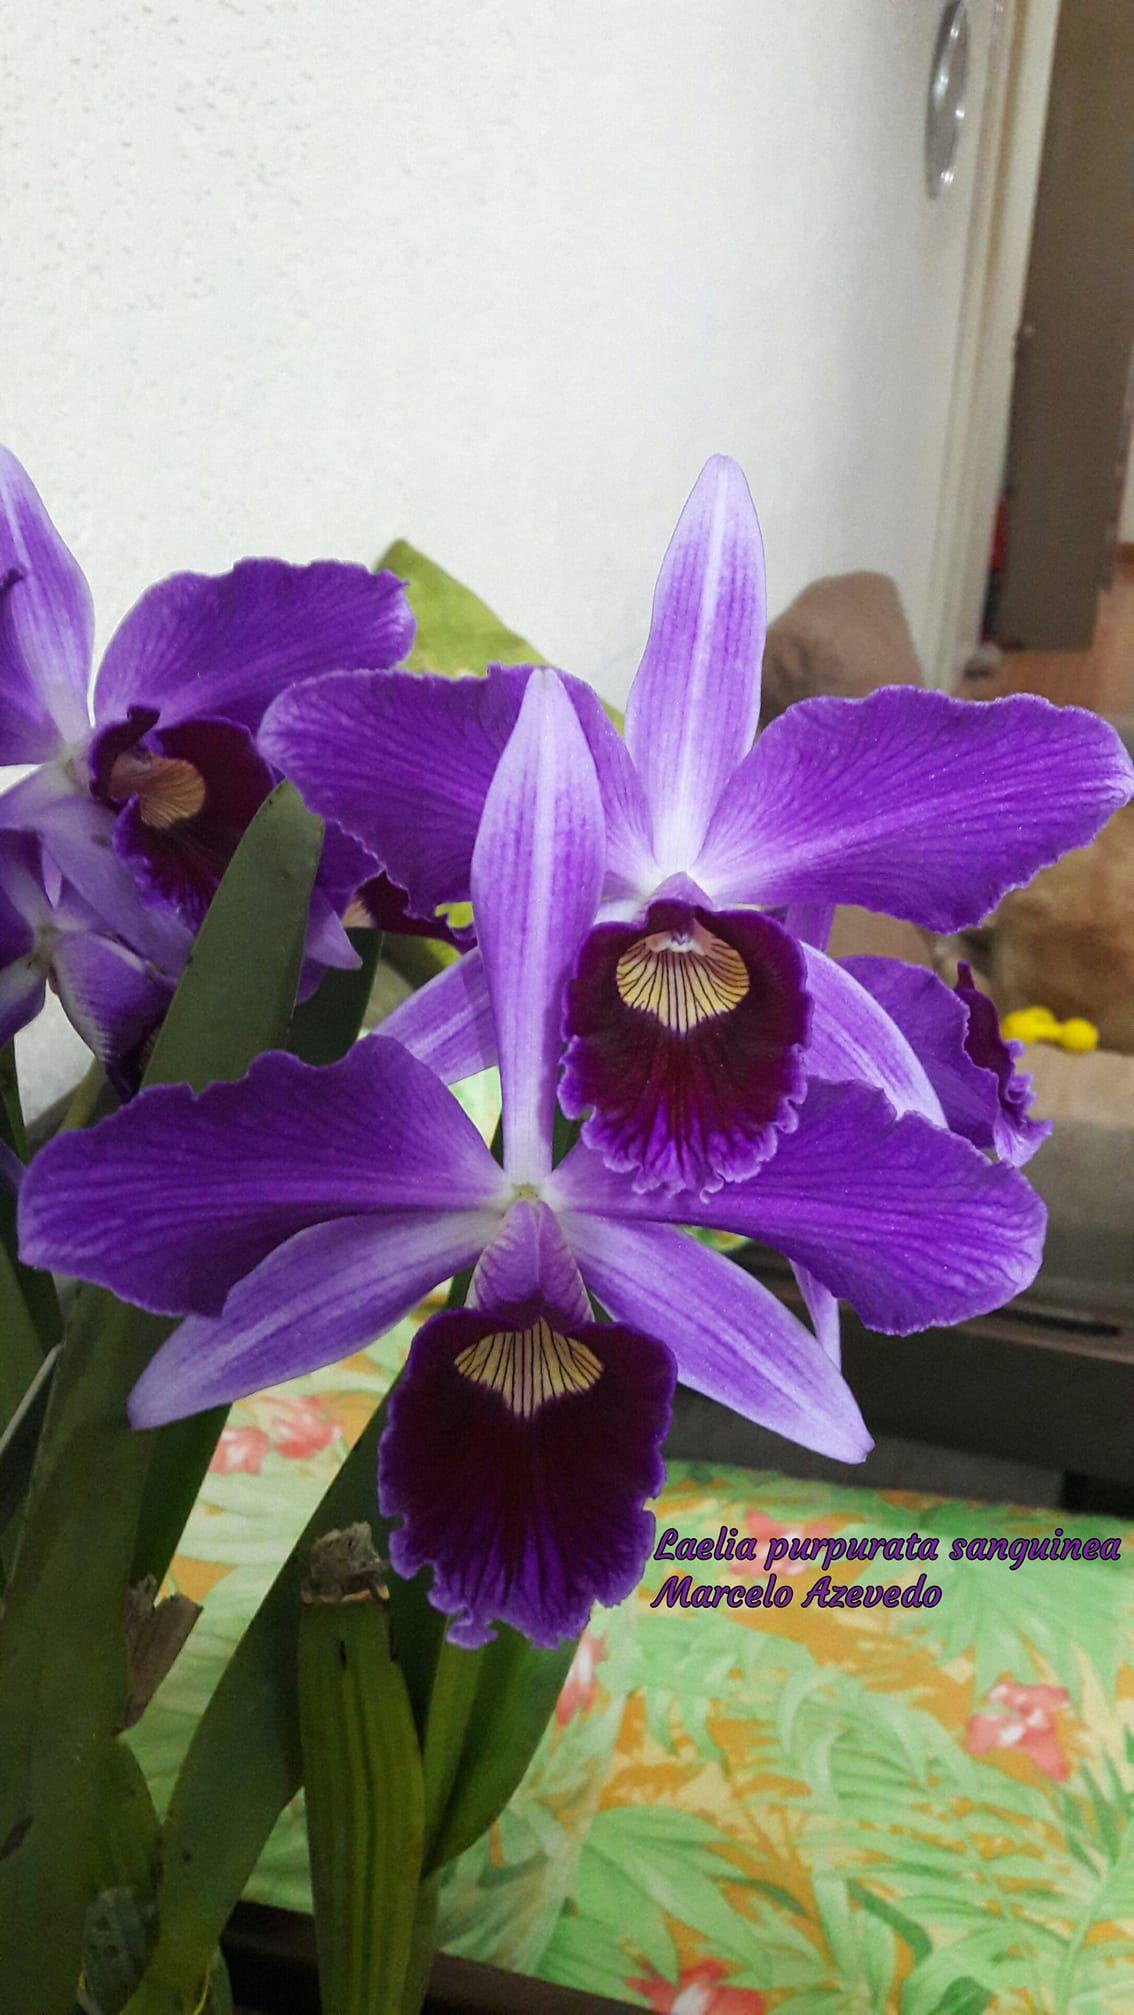 Laelia purpurata sanguinea orkideu orchids flowers og nature plants